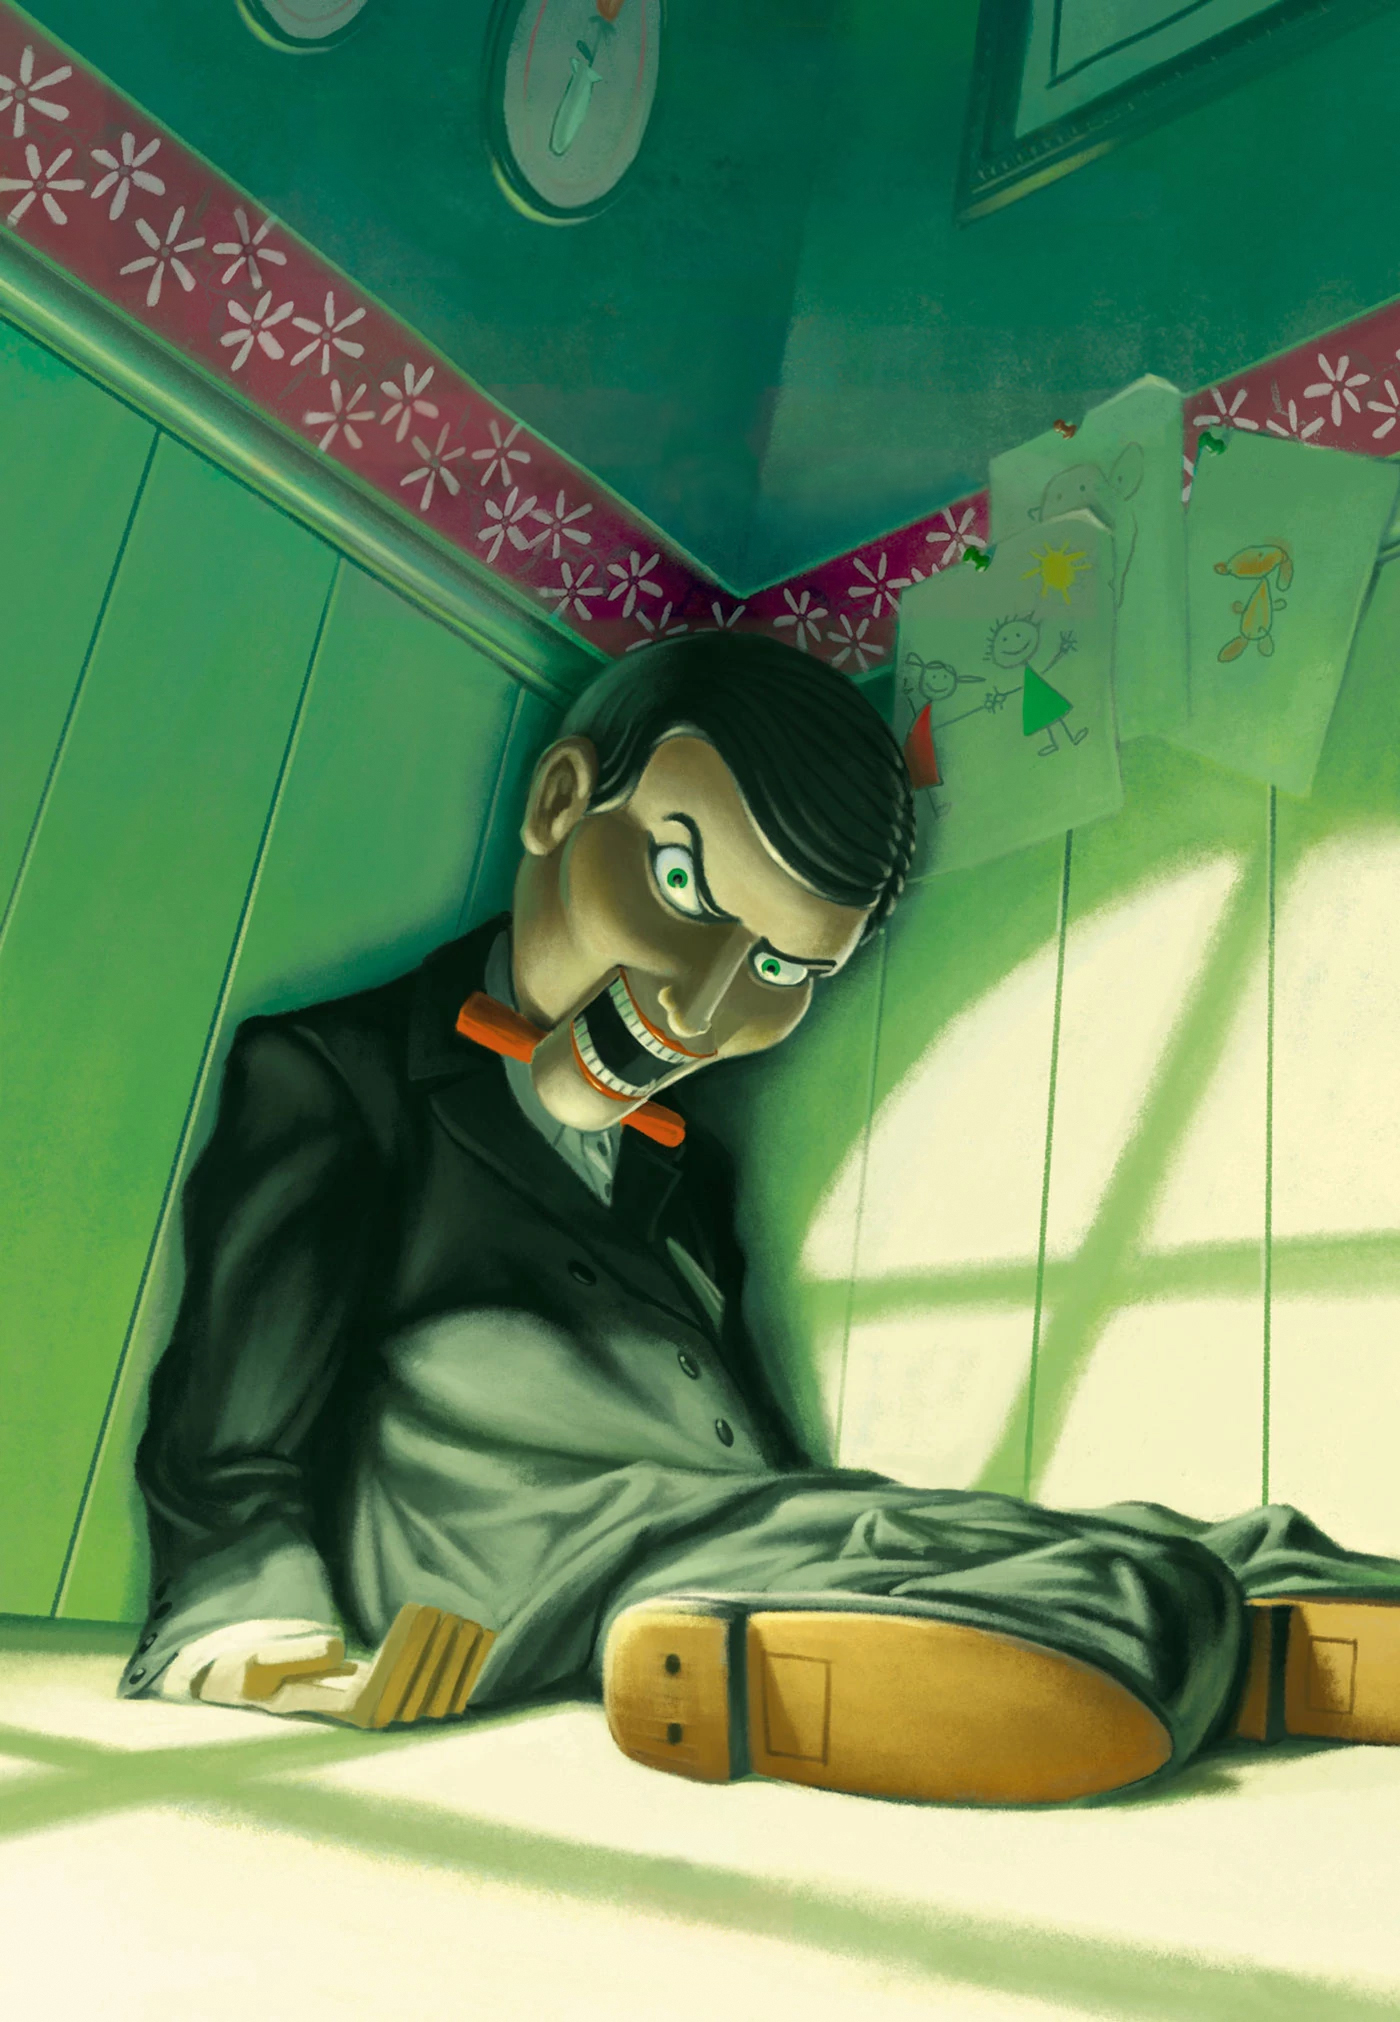 SLAPPY THE DUMMY GOOSEBUMPS COLORING PAGES - Goosebumps Slappy ... | 2022x1400